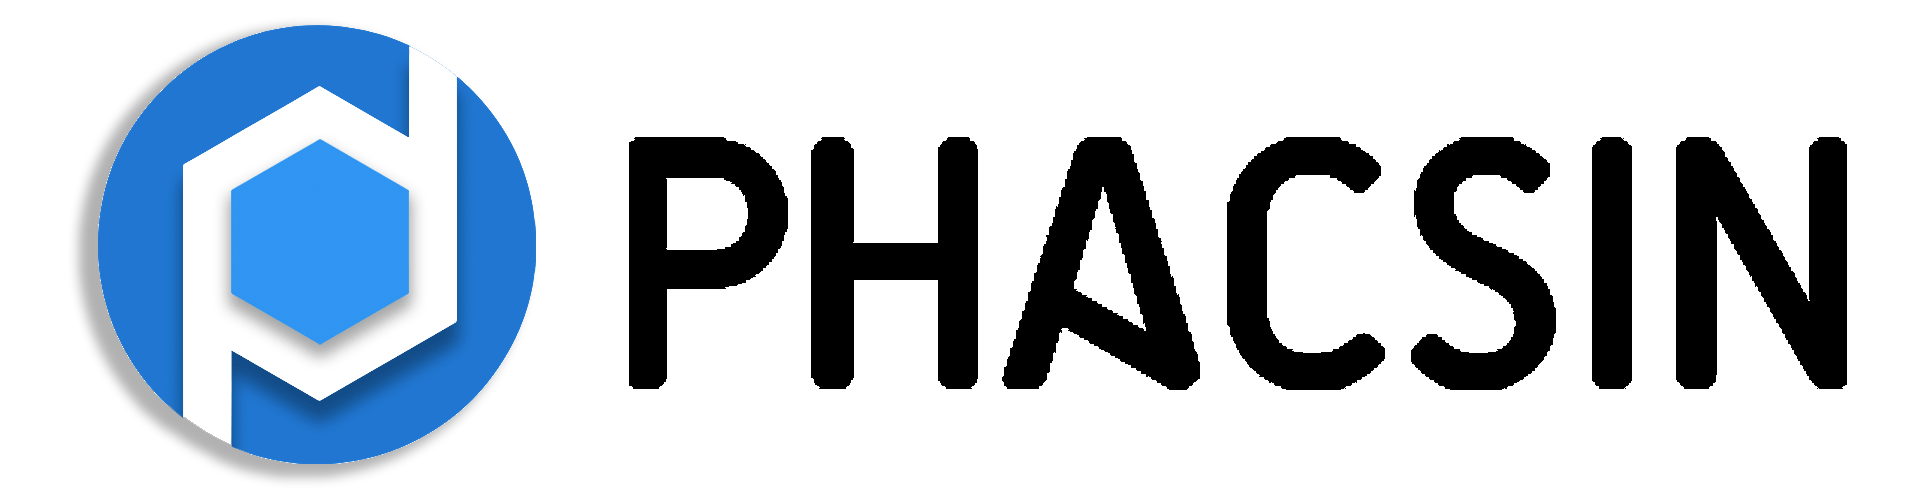 phacsin black